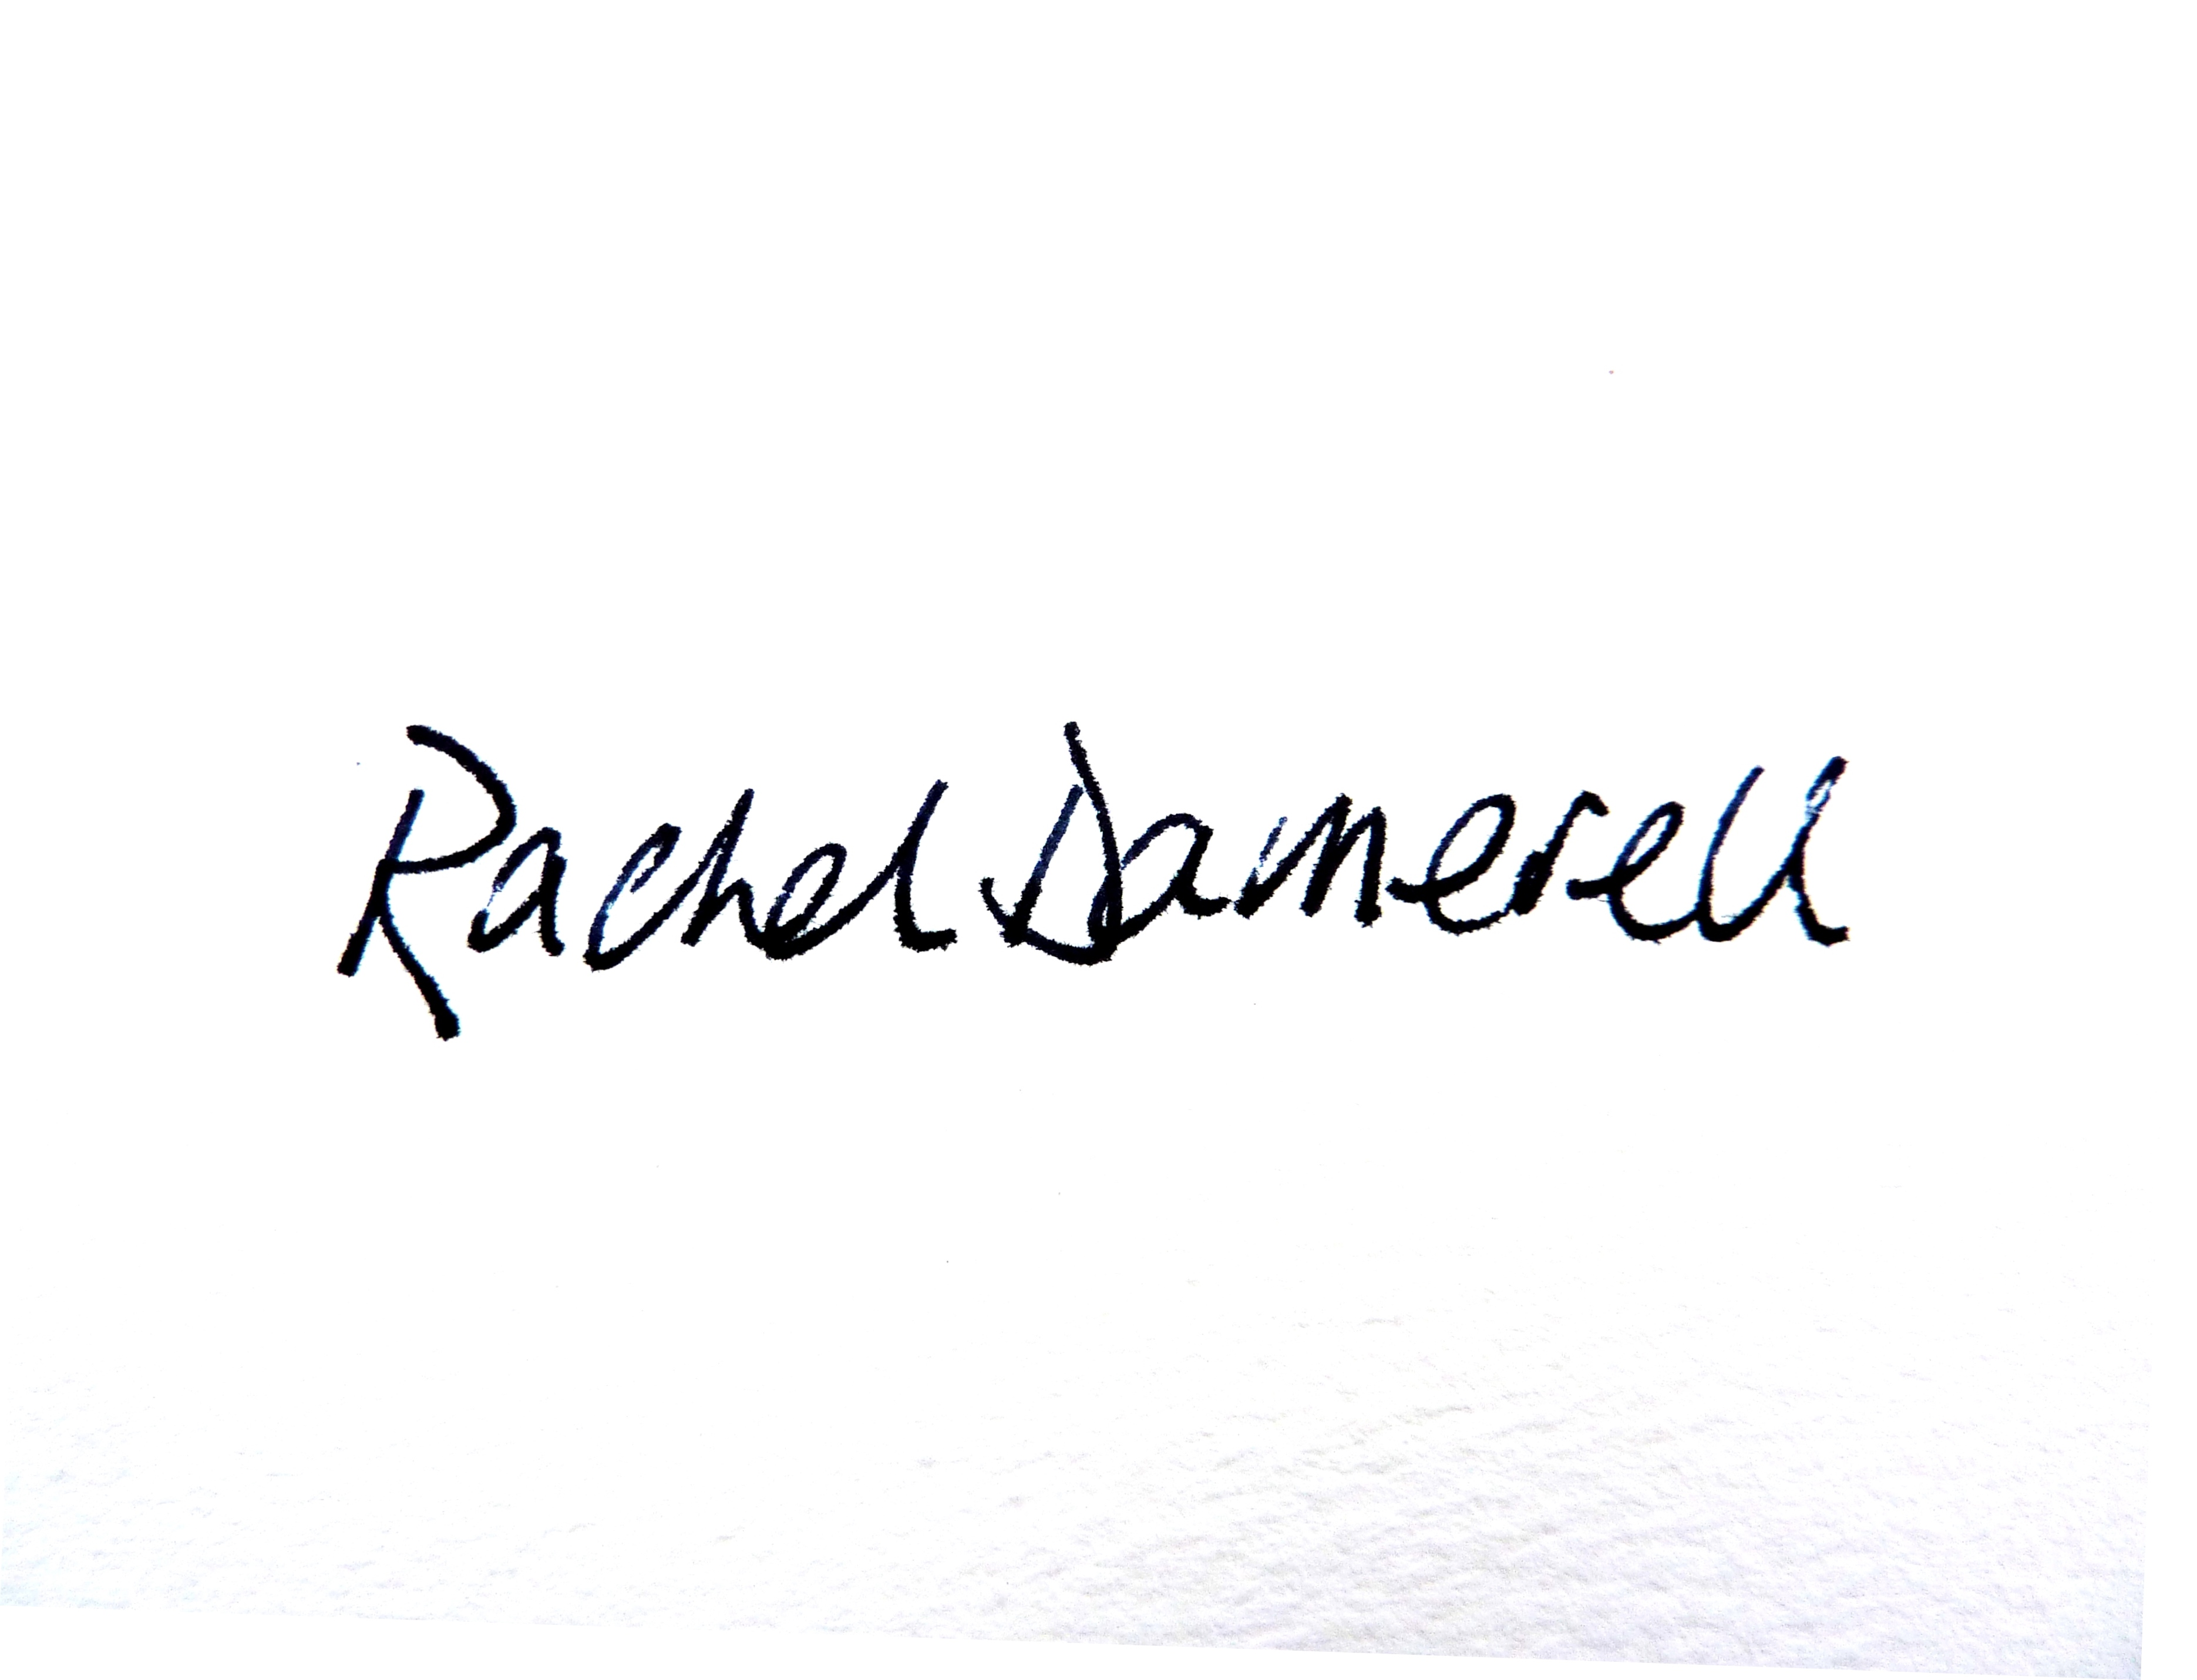 Rachel Damerell Signature